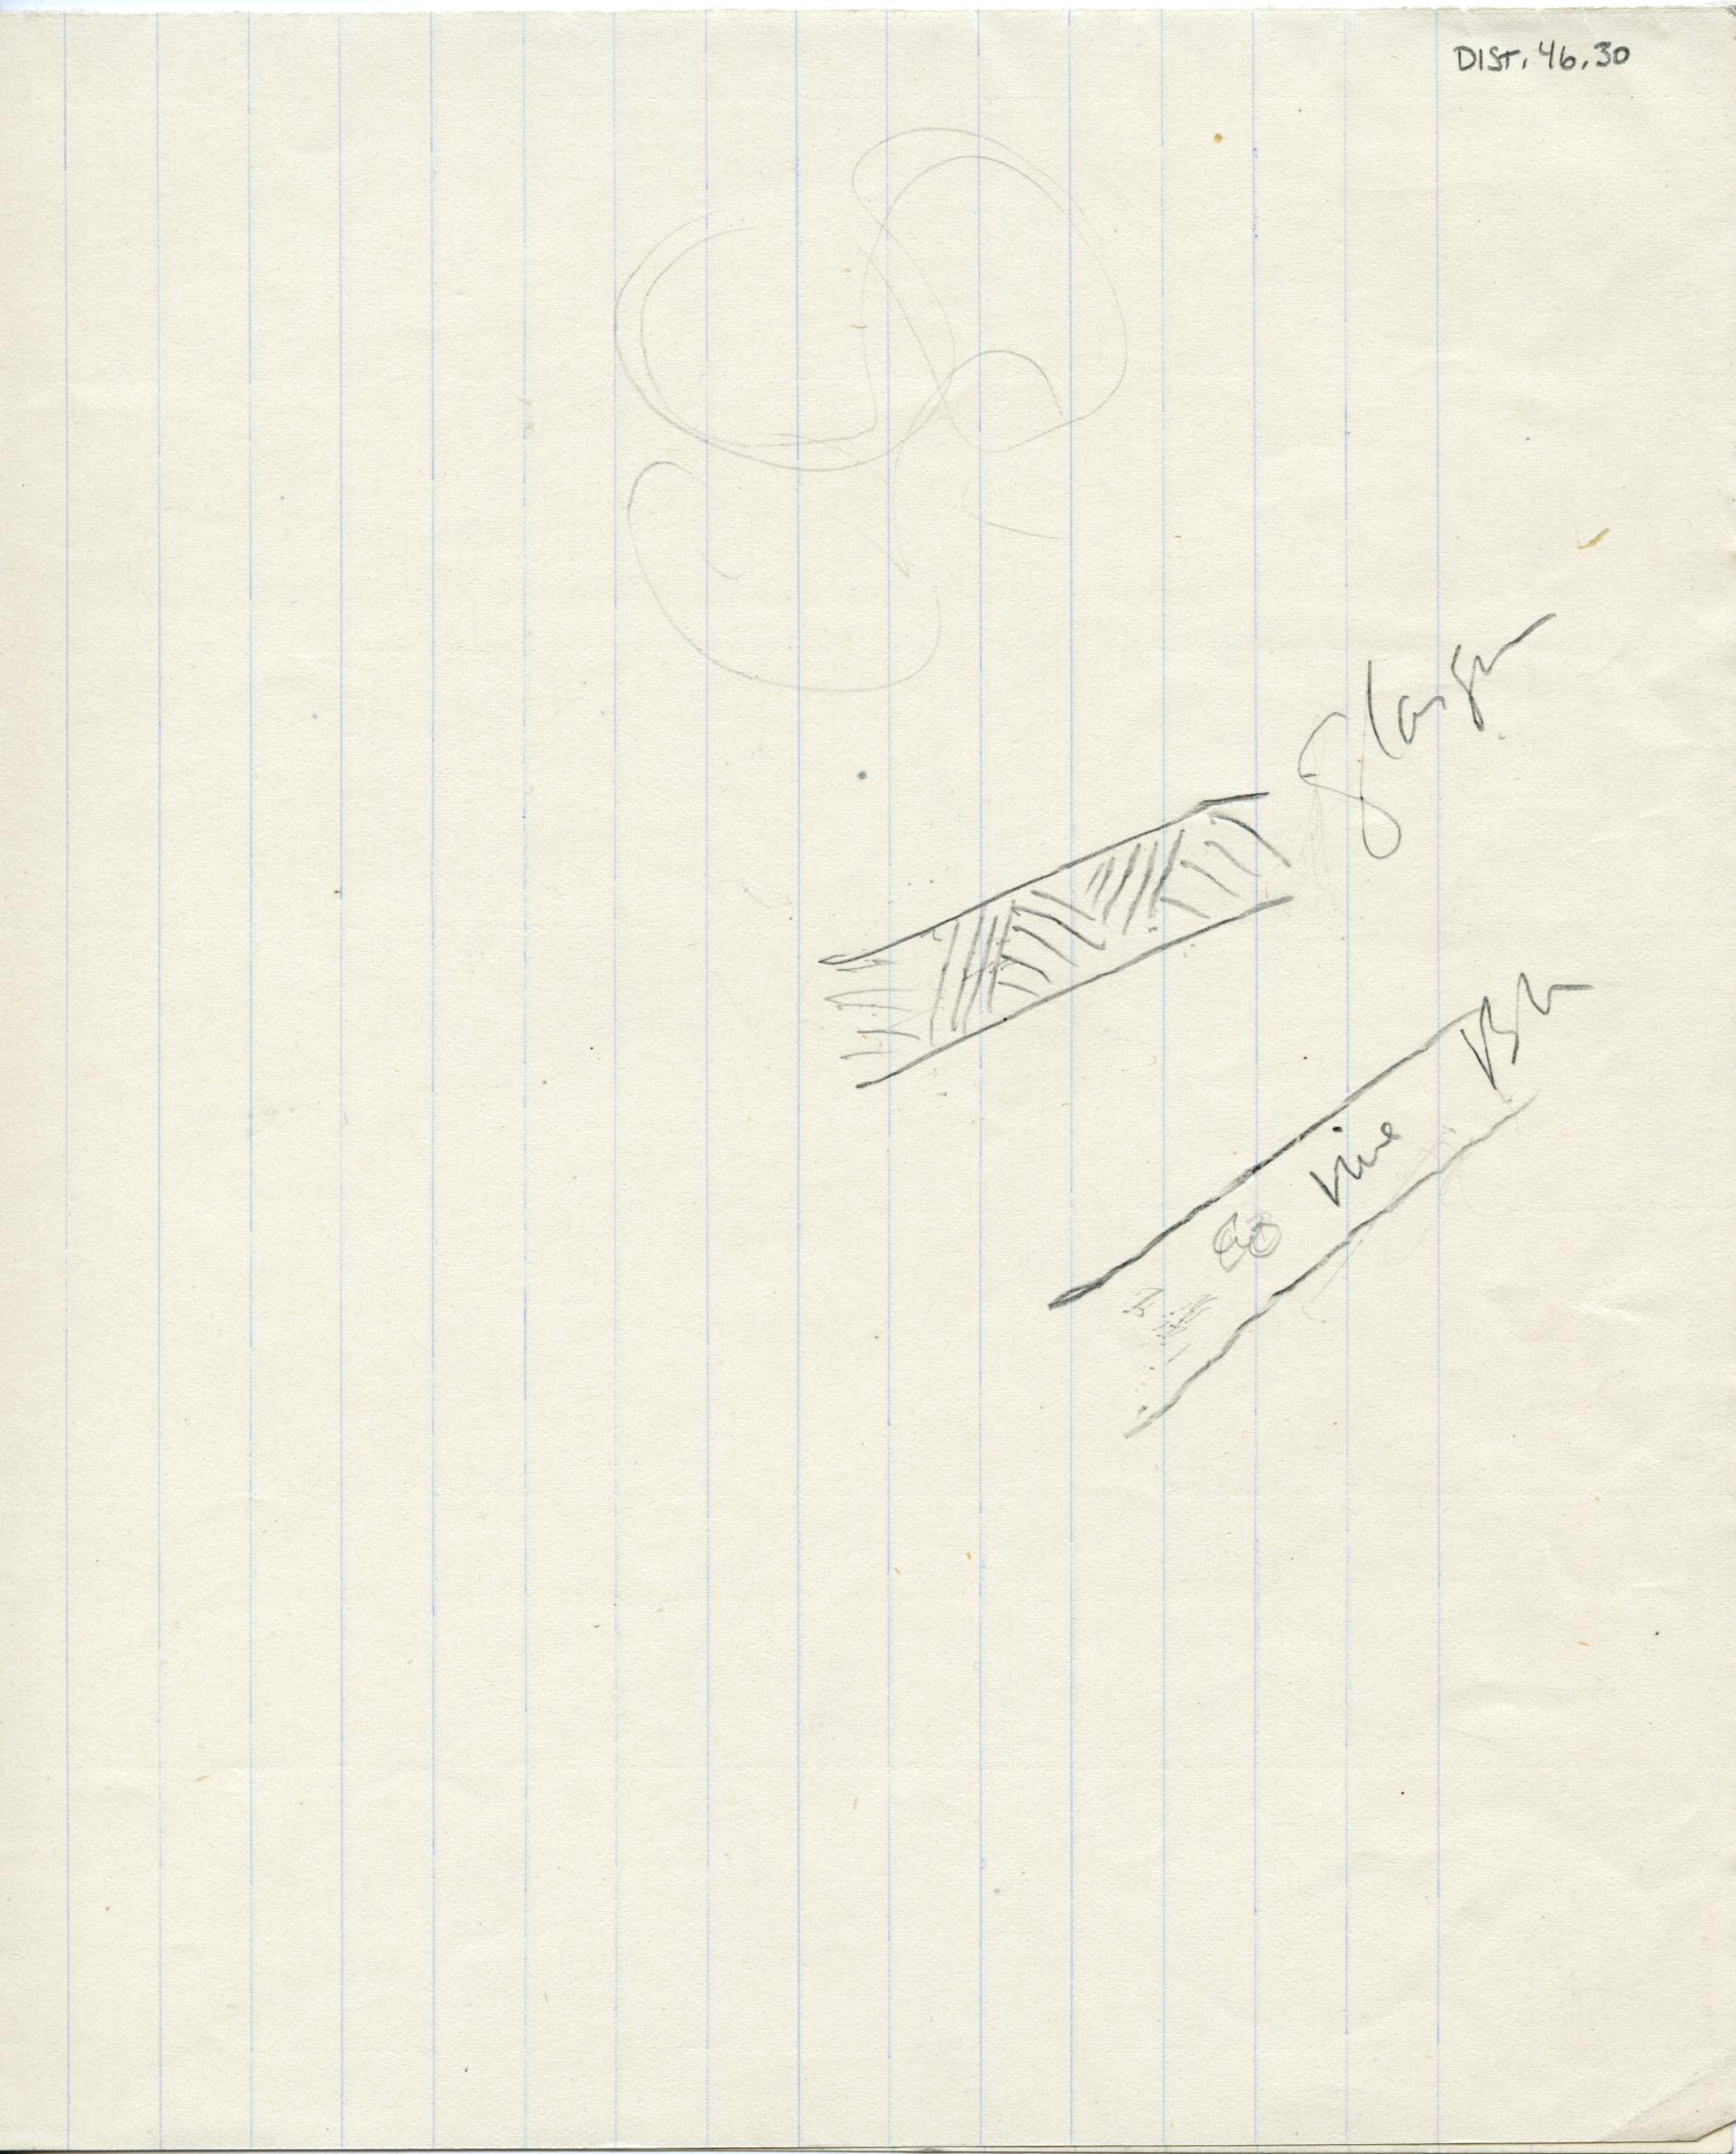 1921-25 el-Amarna DIST.46.30